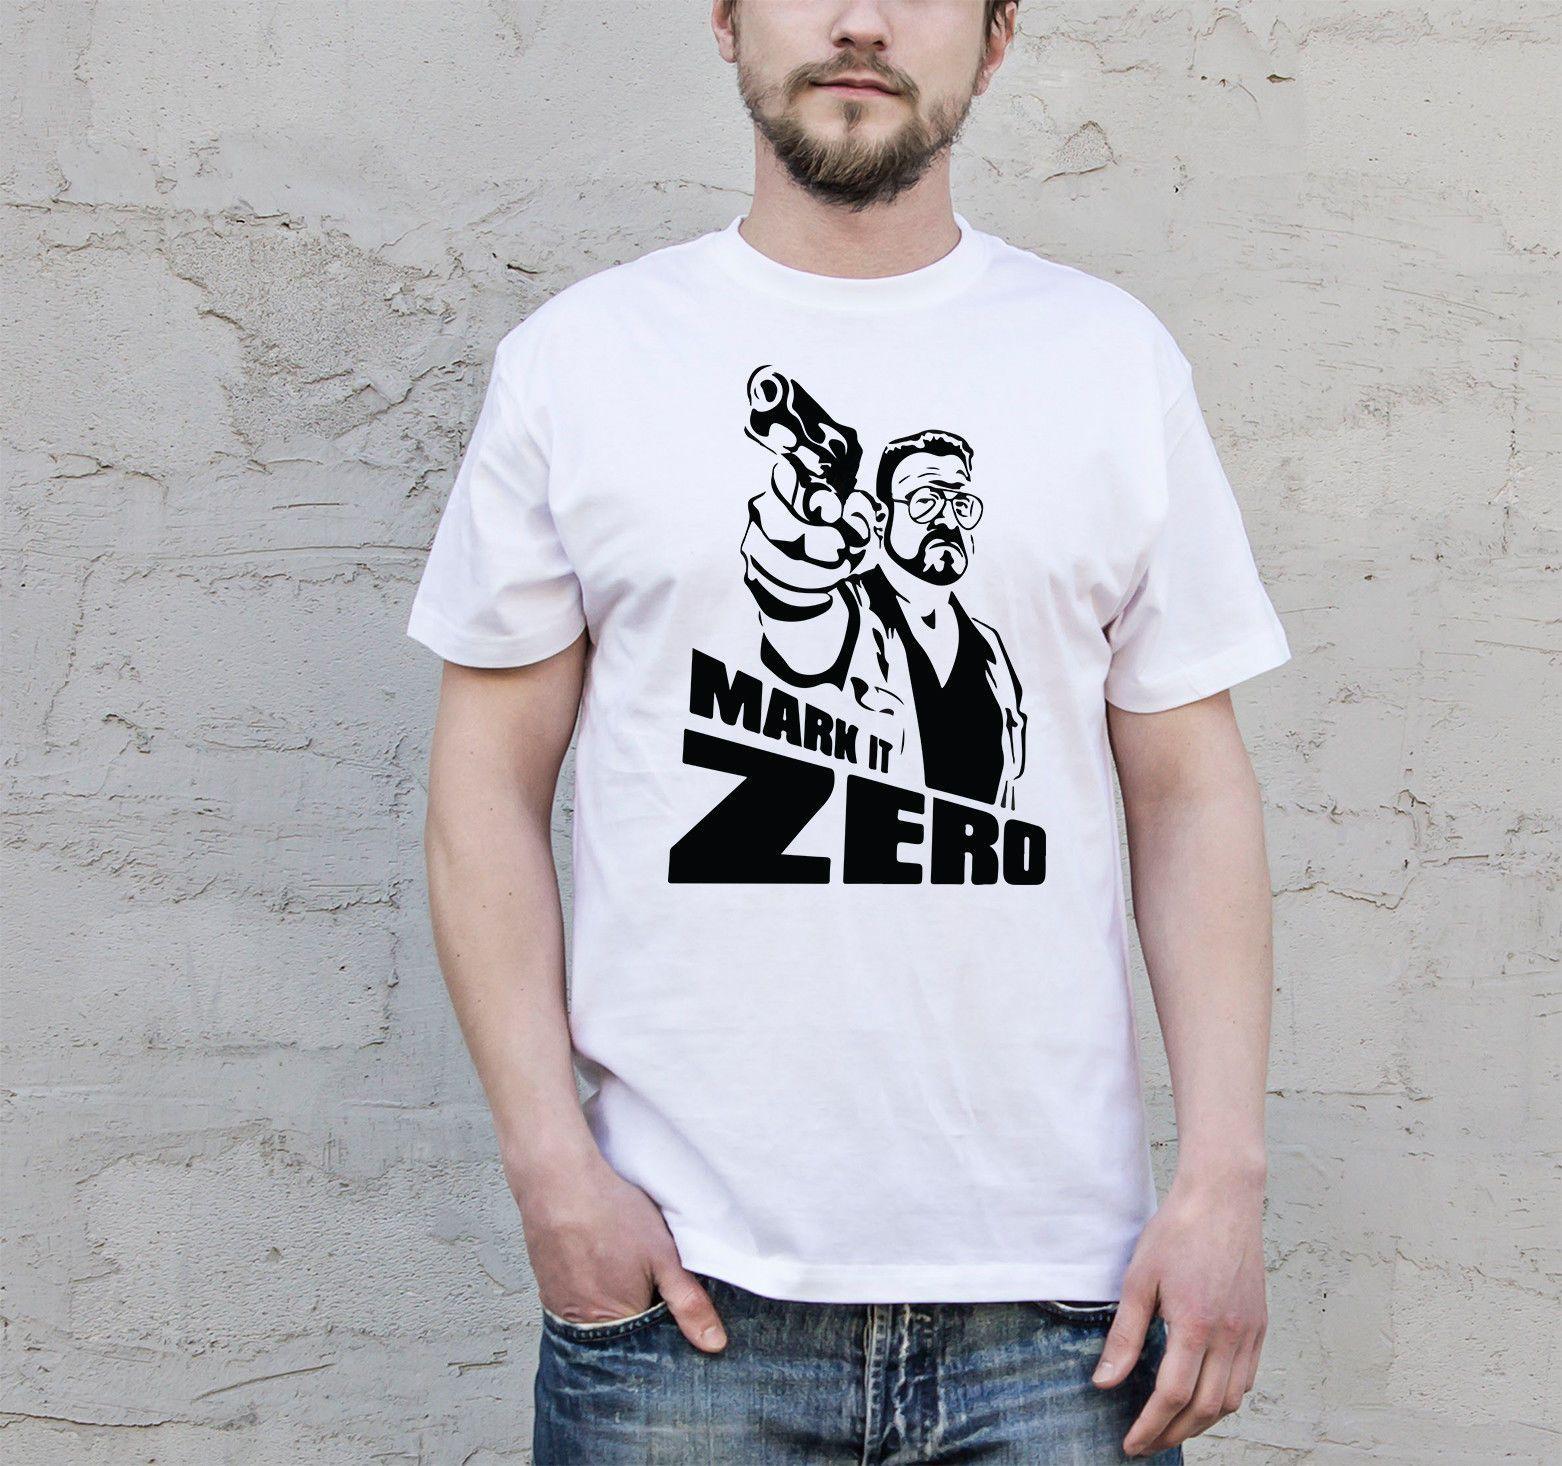 32a10579c Mark T Zero Funny Movie T Shirt Long Sleeve T Shirt Medium Large Printed  Shirtcattt Windbreaker Pug Tshirt Trump Sweat Sporter T Shirt Shirts  Designer ...